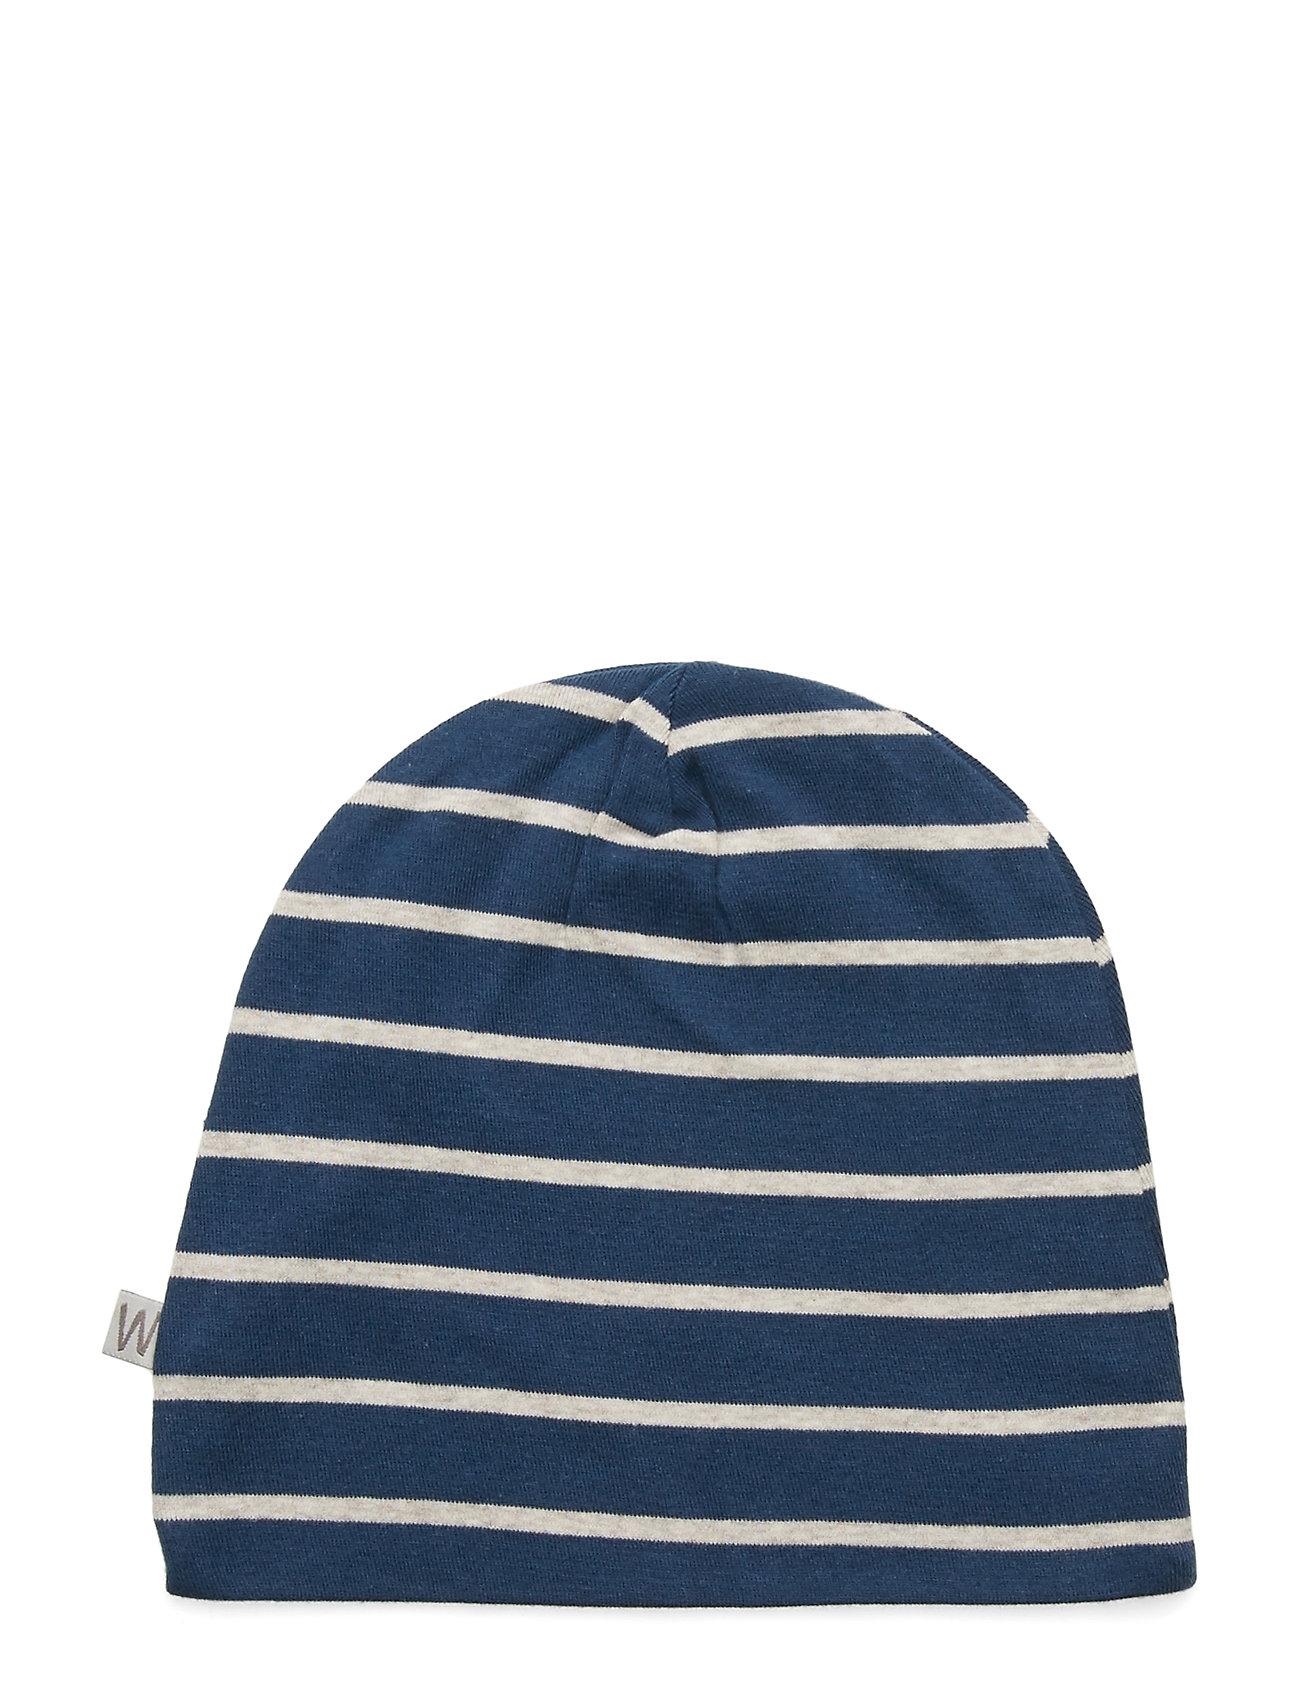 Wheat Hat Soft - INDIGO